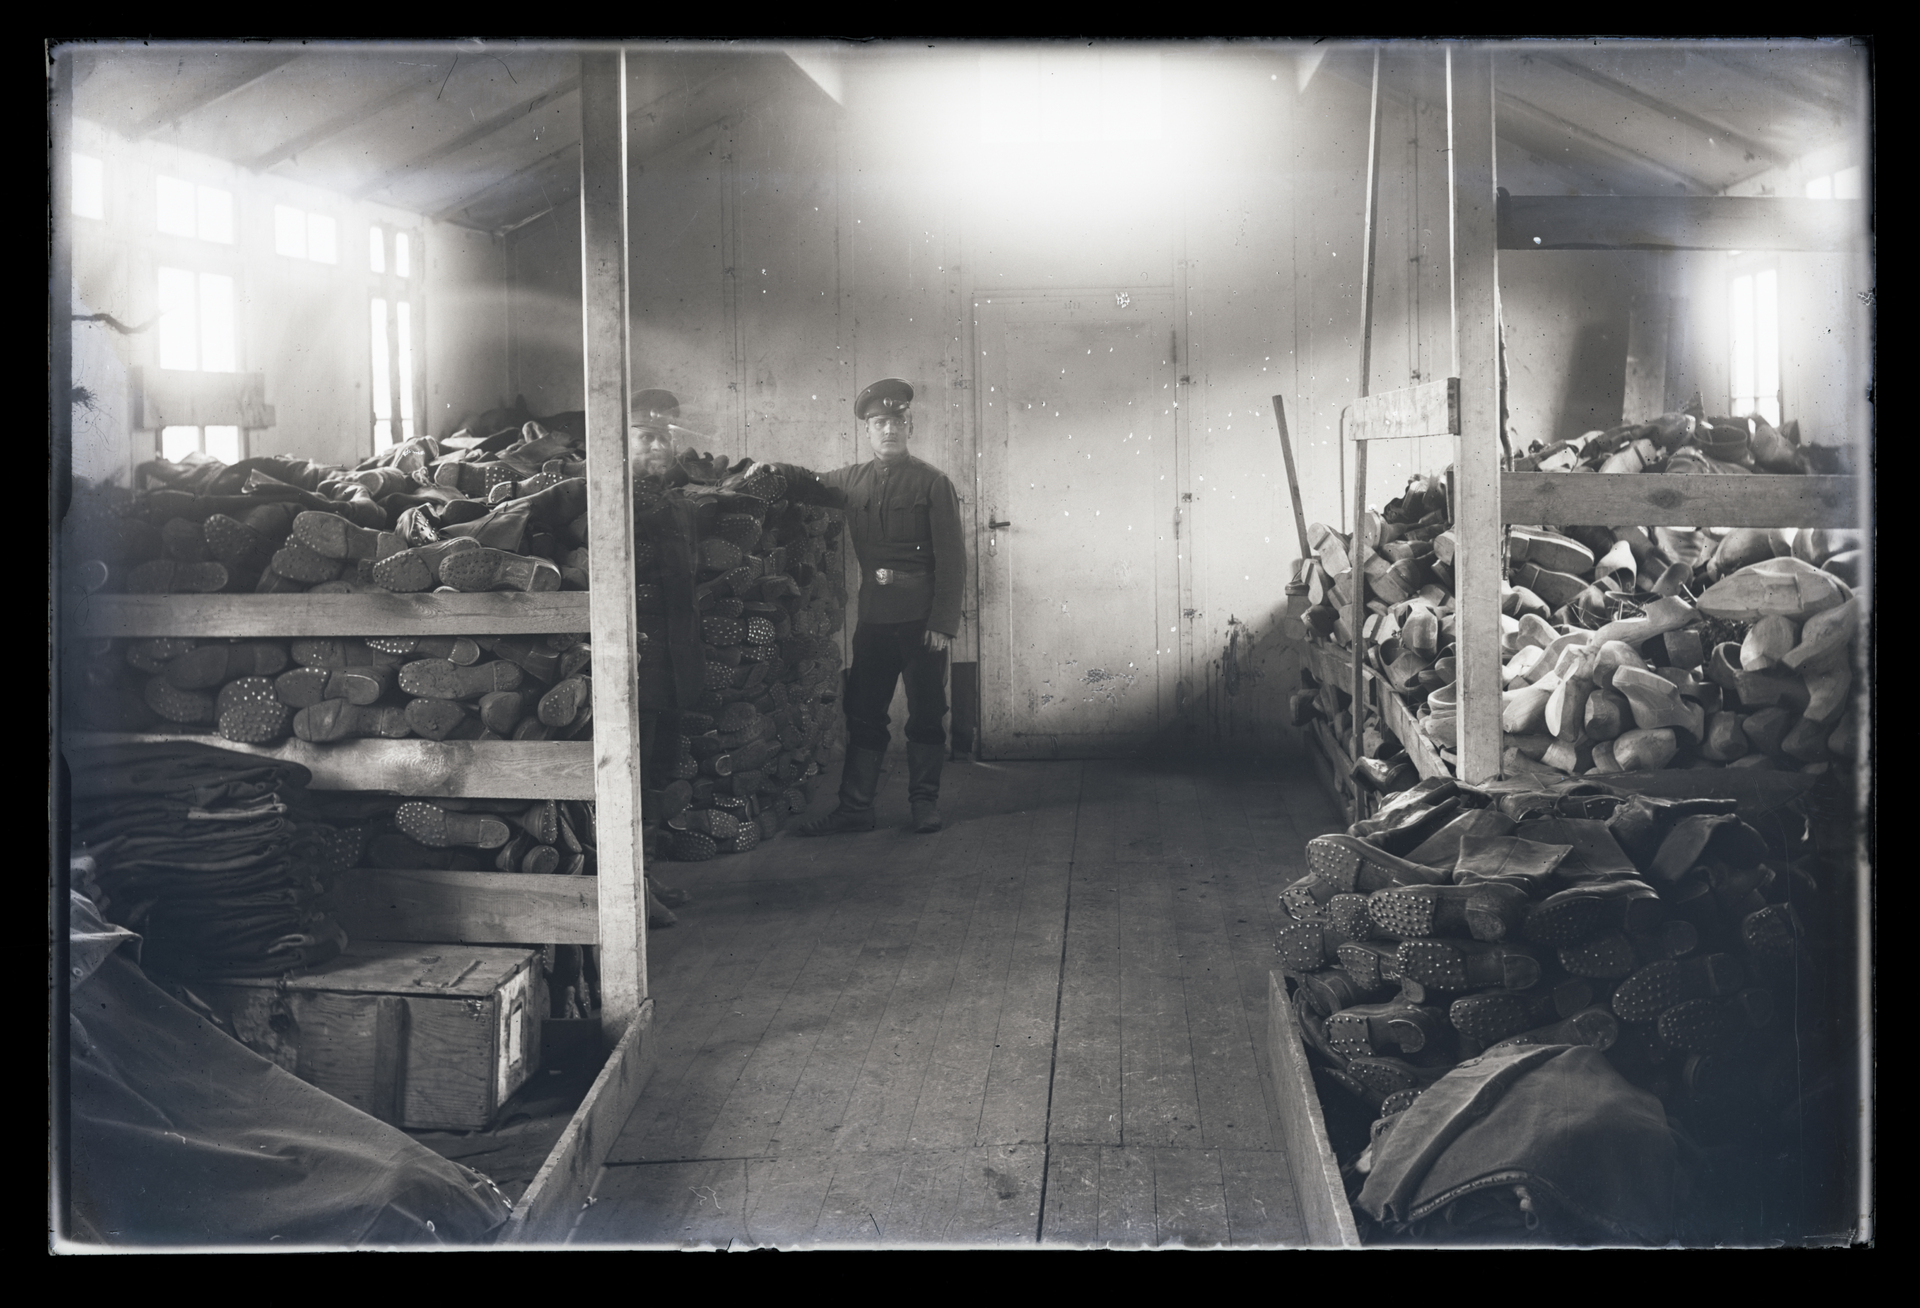 Kriegsgefangenenlager_image_0473.jpg